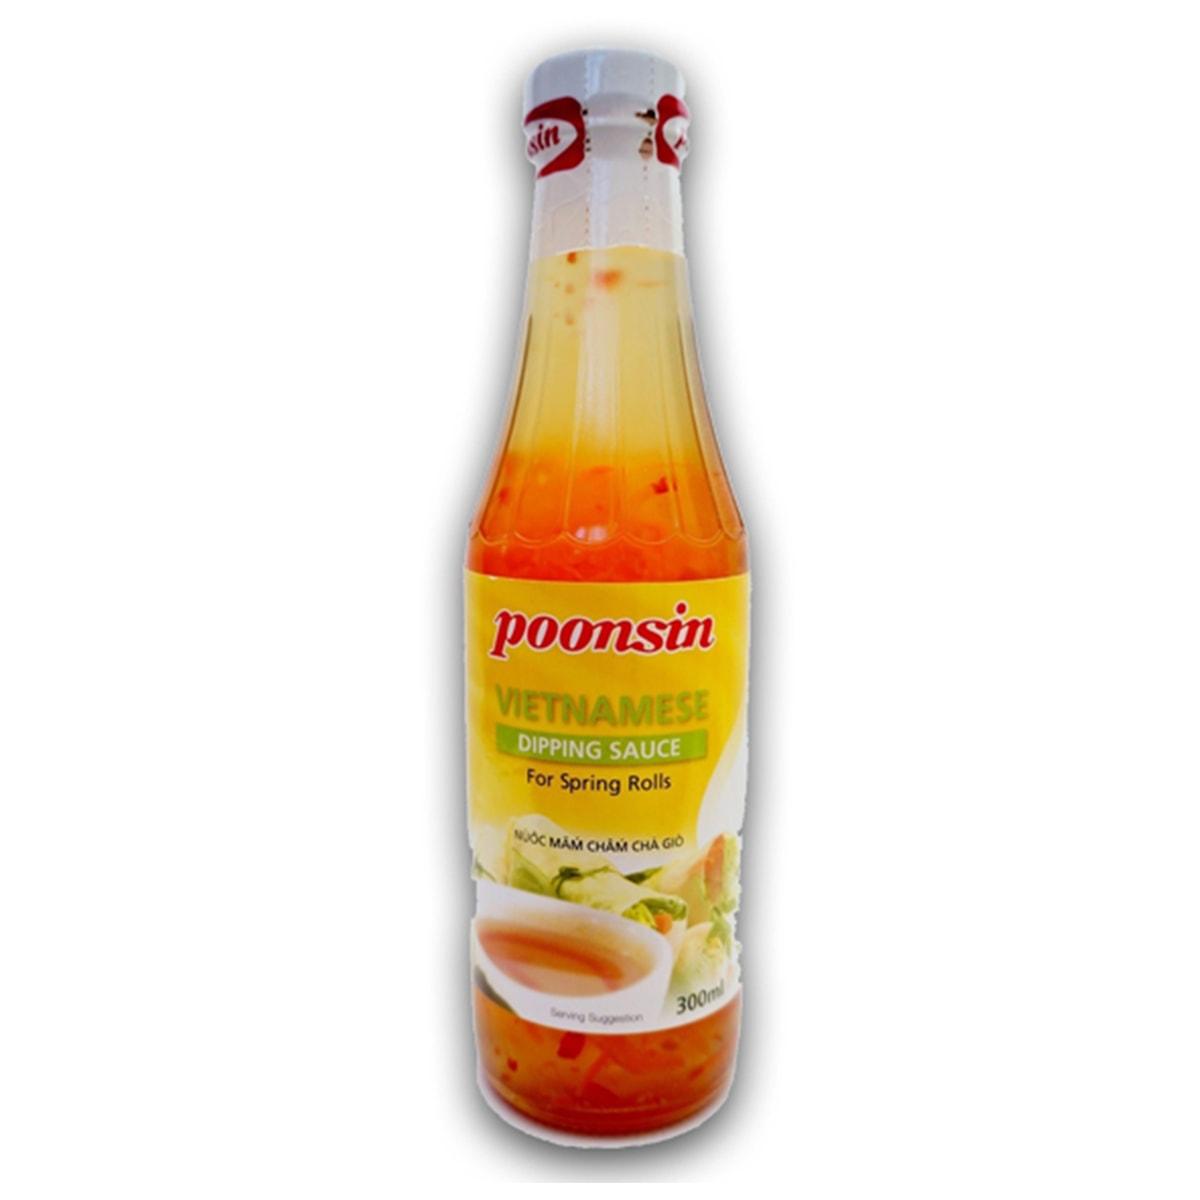 Buy Poonsin Vietnamese Dipping Sauce for Spring Roll - 300 ml